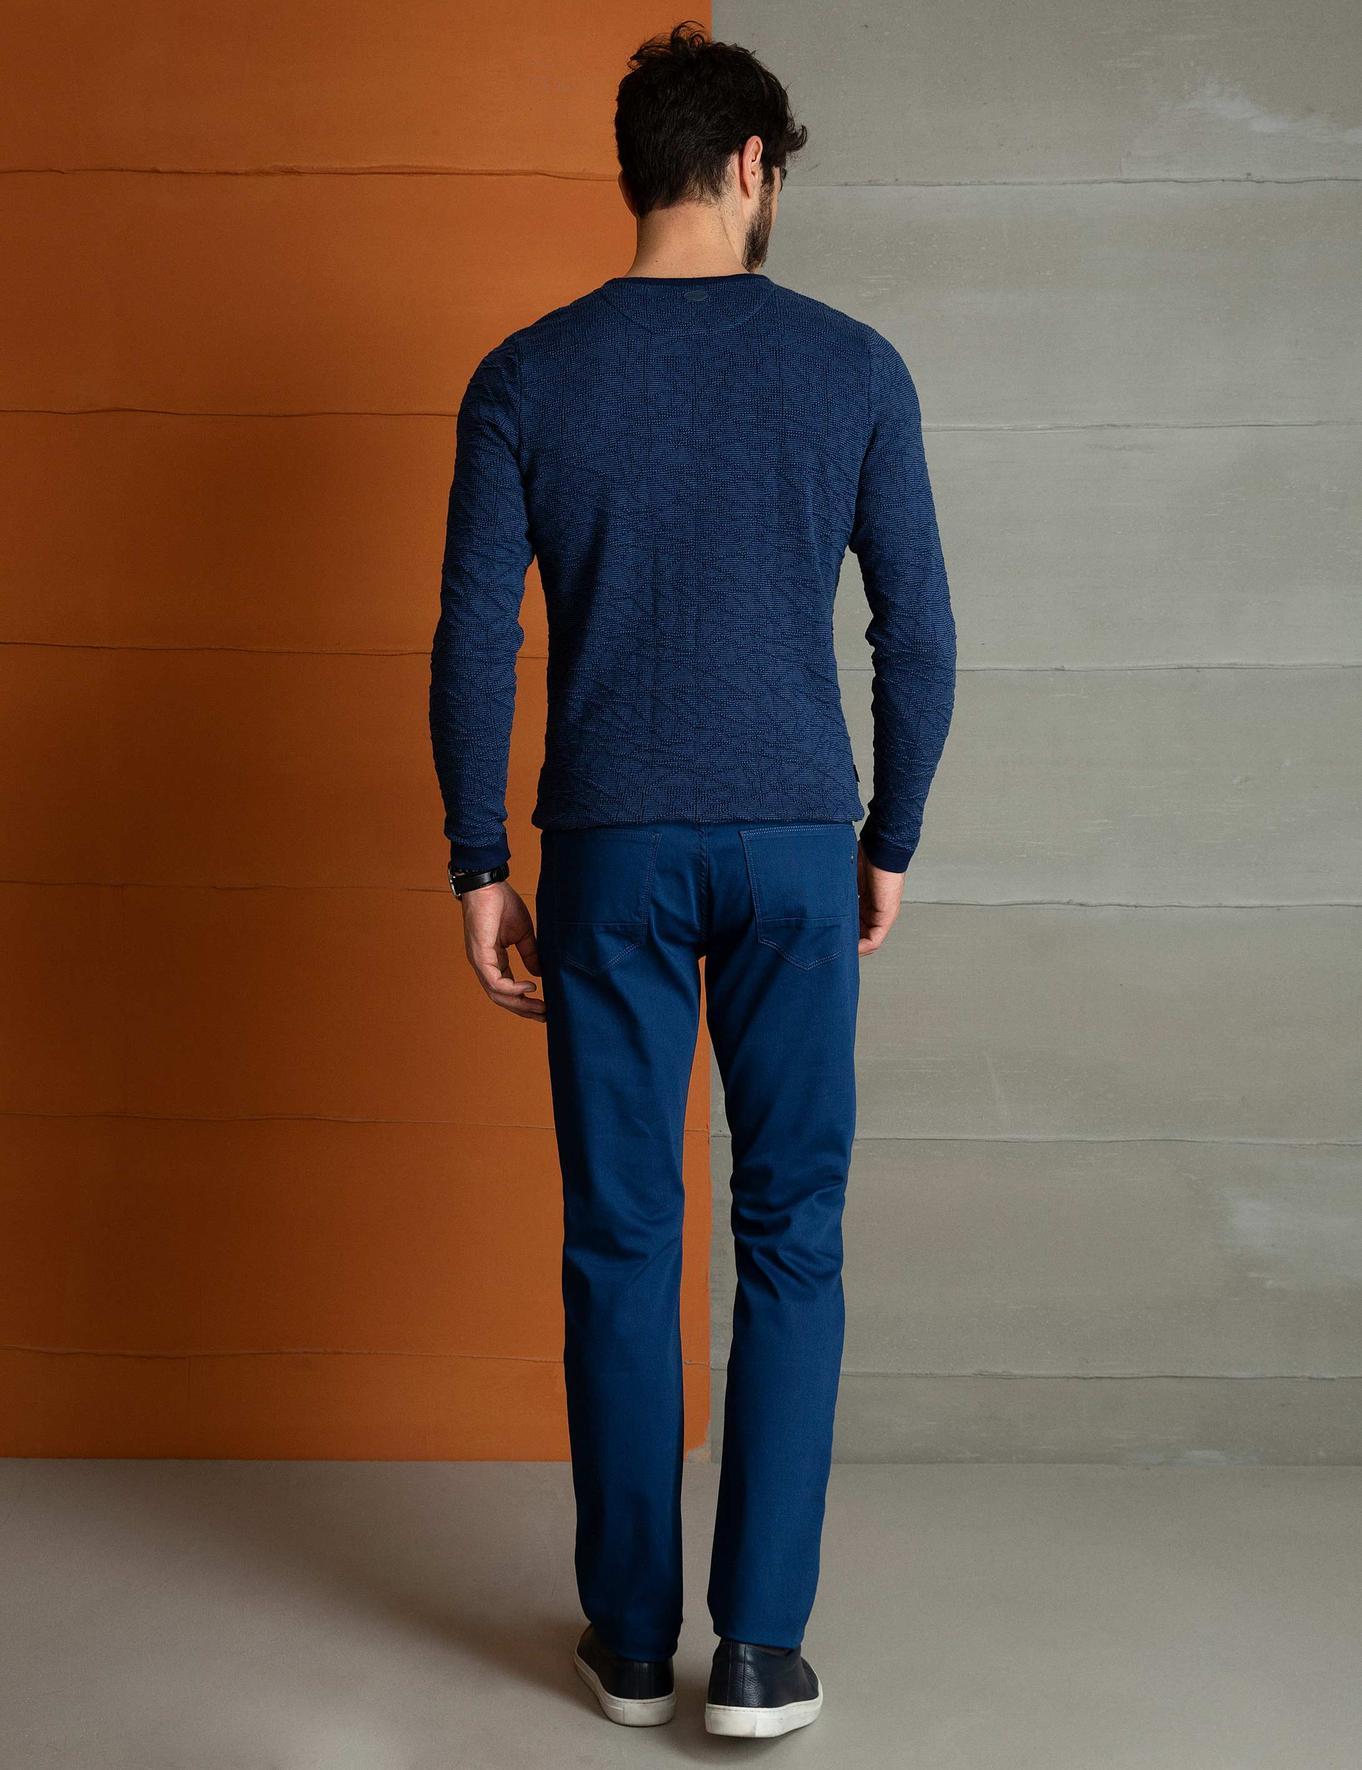 Mavi Chino Pantolon